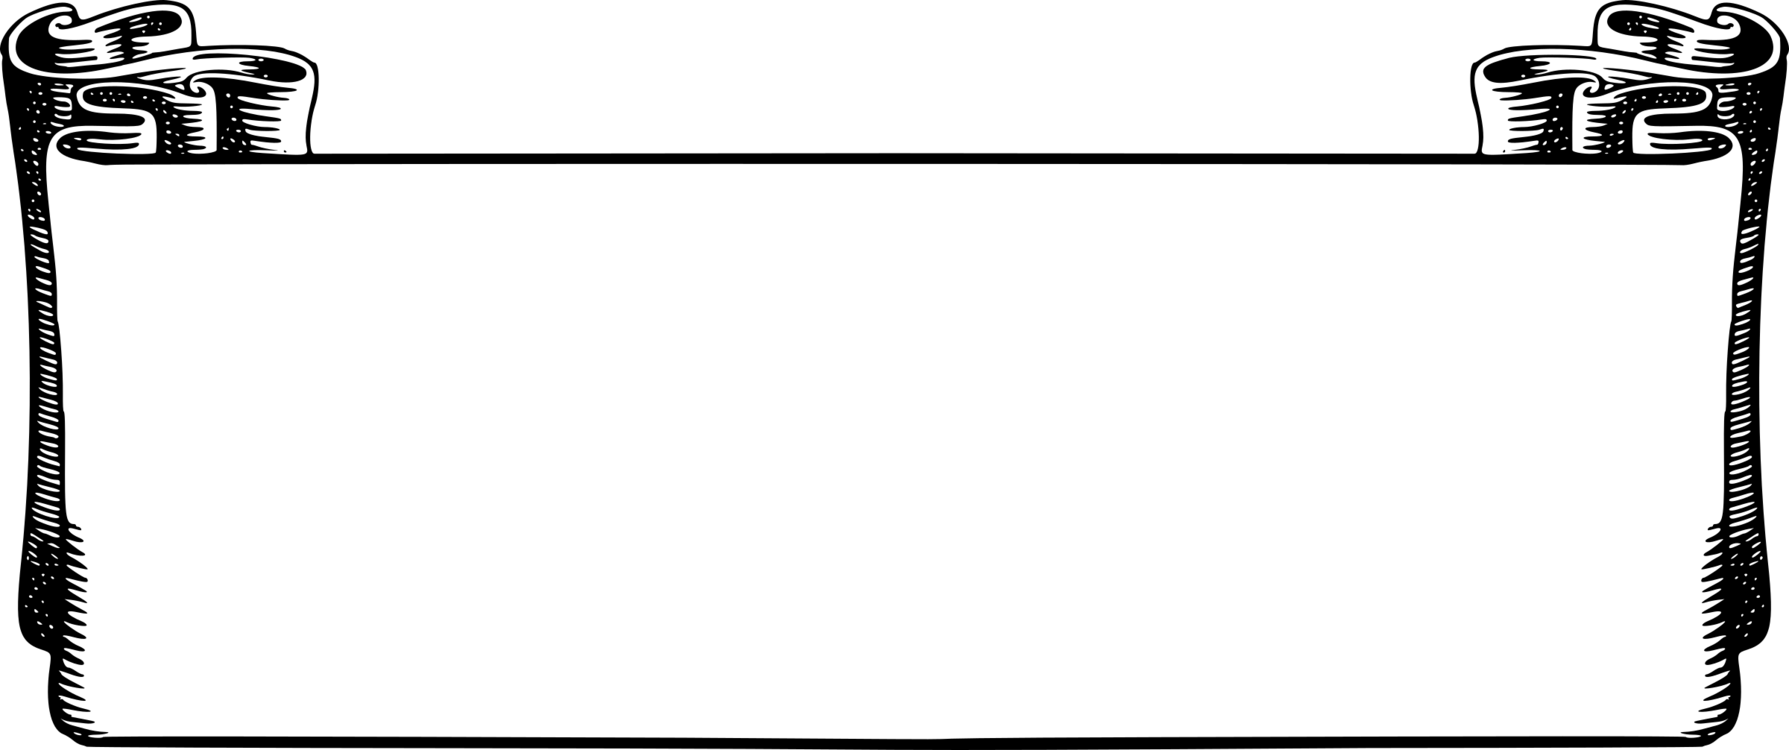 Square,Area,Text